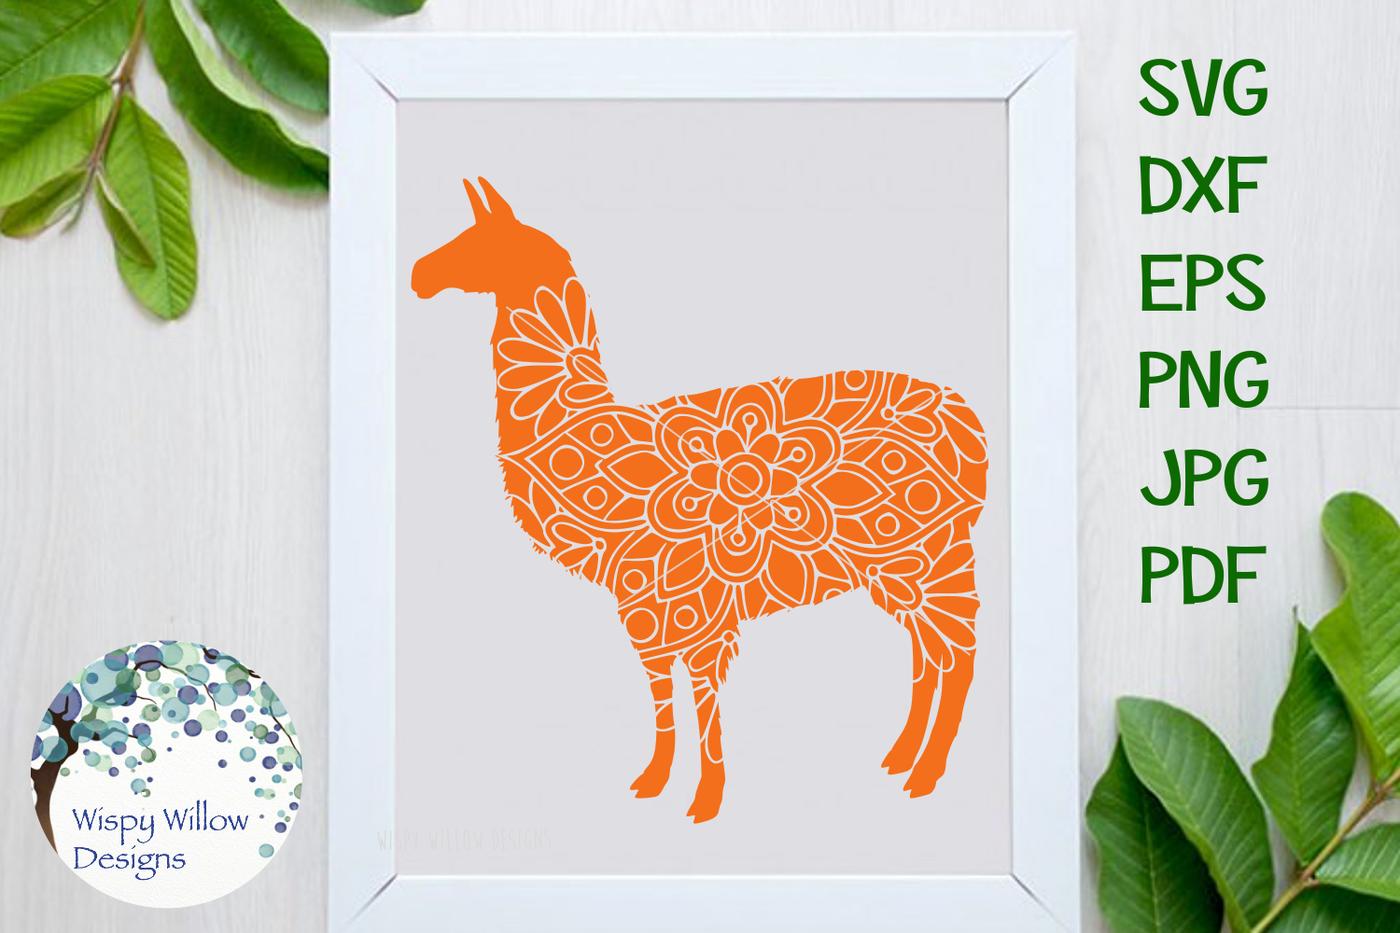 Llama Floral Mandala Svg Dxf Eps Png Jpg Pdf By Wispy Willow